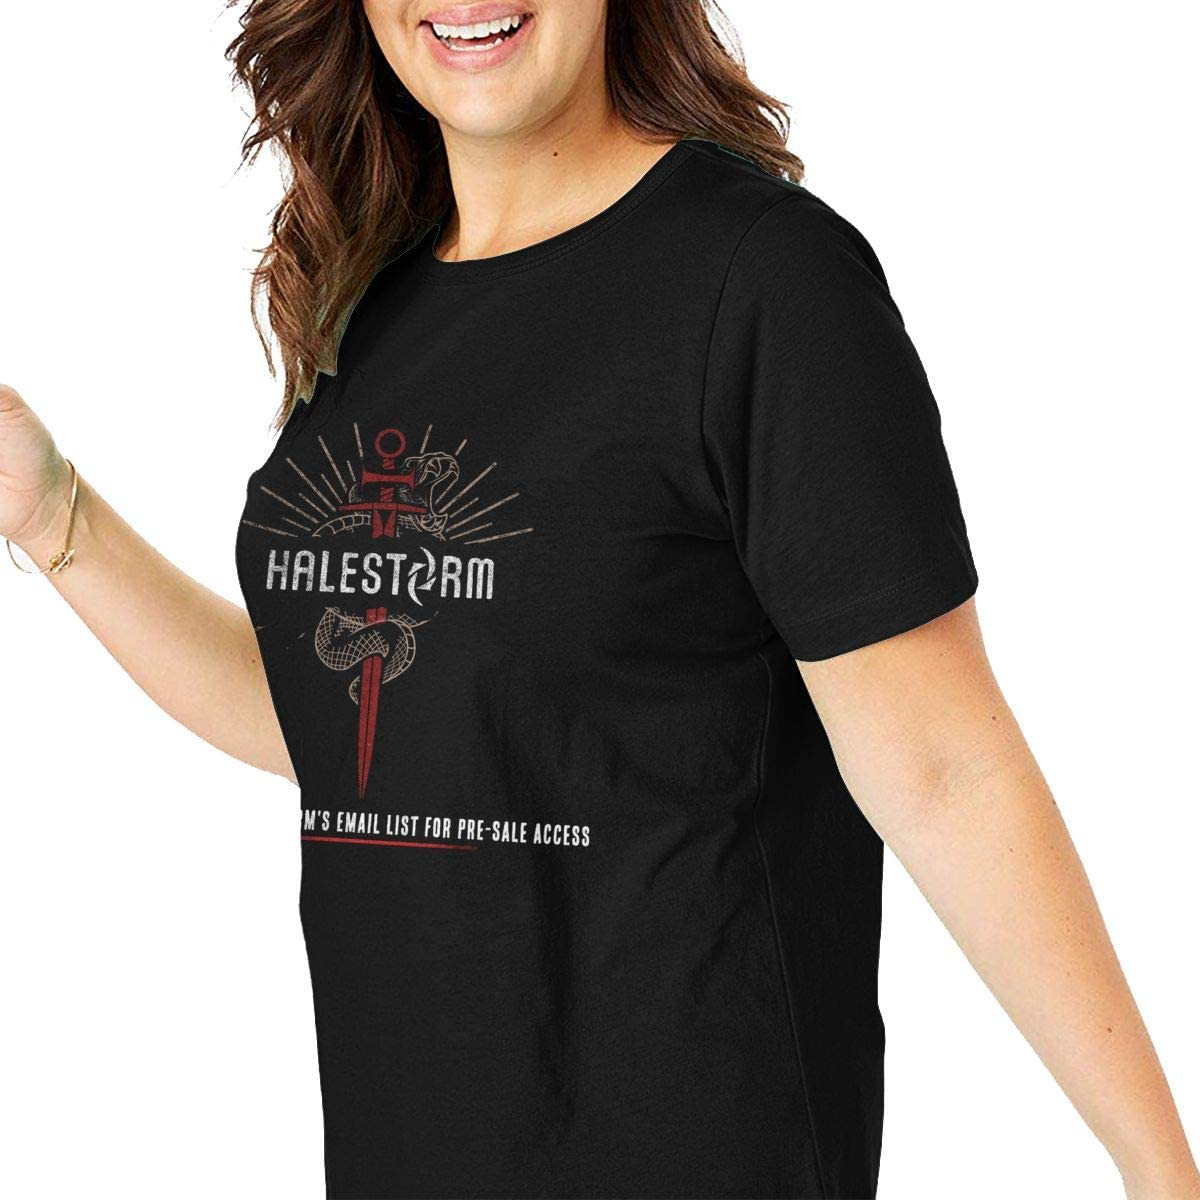 Bonnie D Erhart Halestorm Womens Popular Short Sleeve Plus Size Cotton Short Sleeve O-Neck Shirts Black